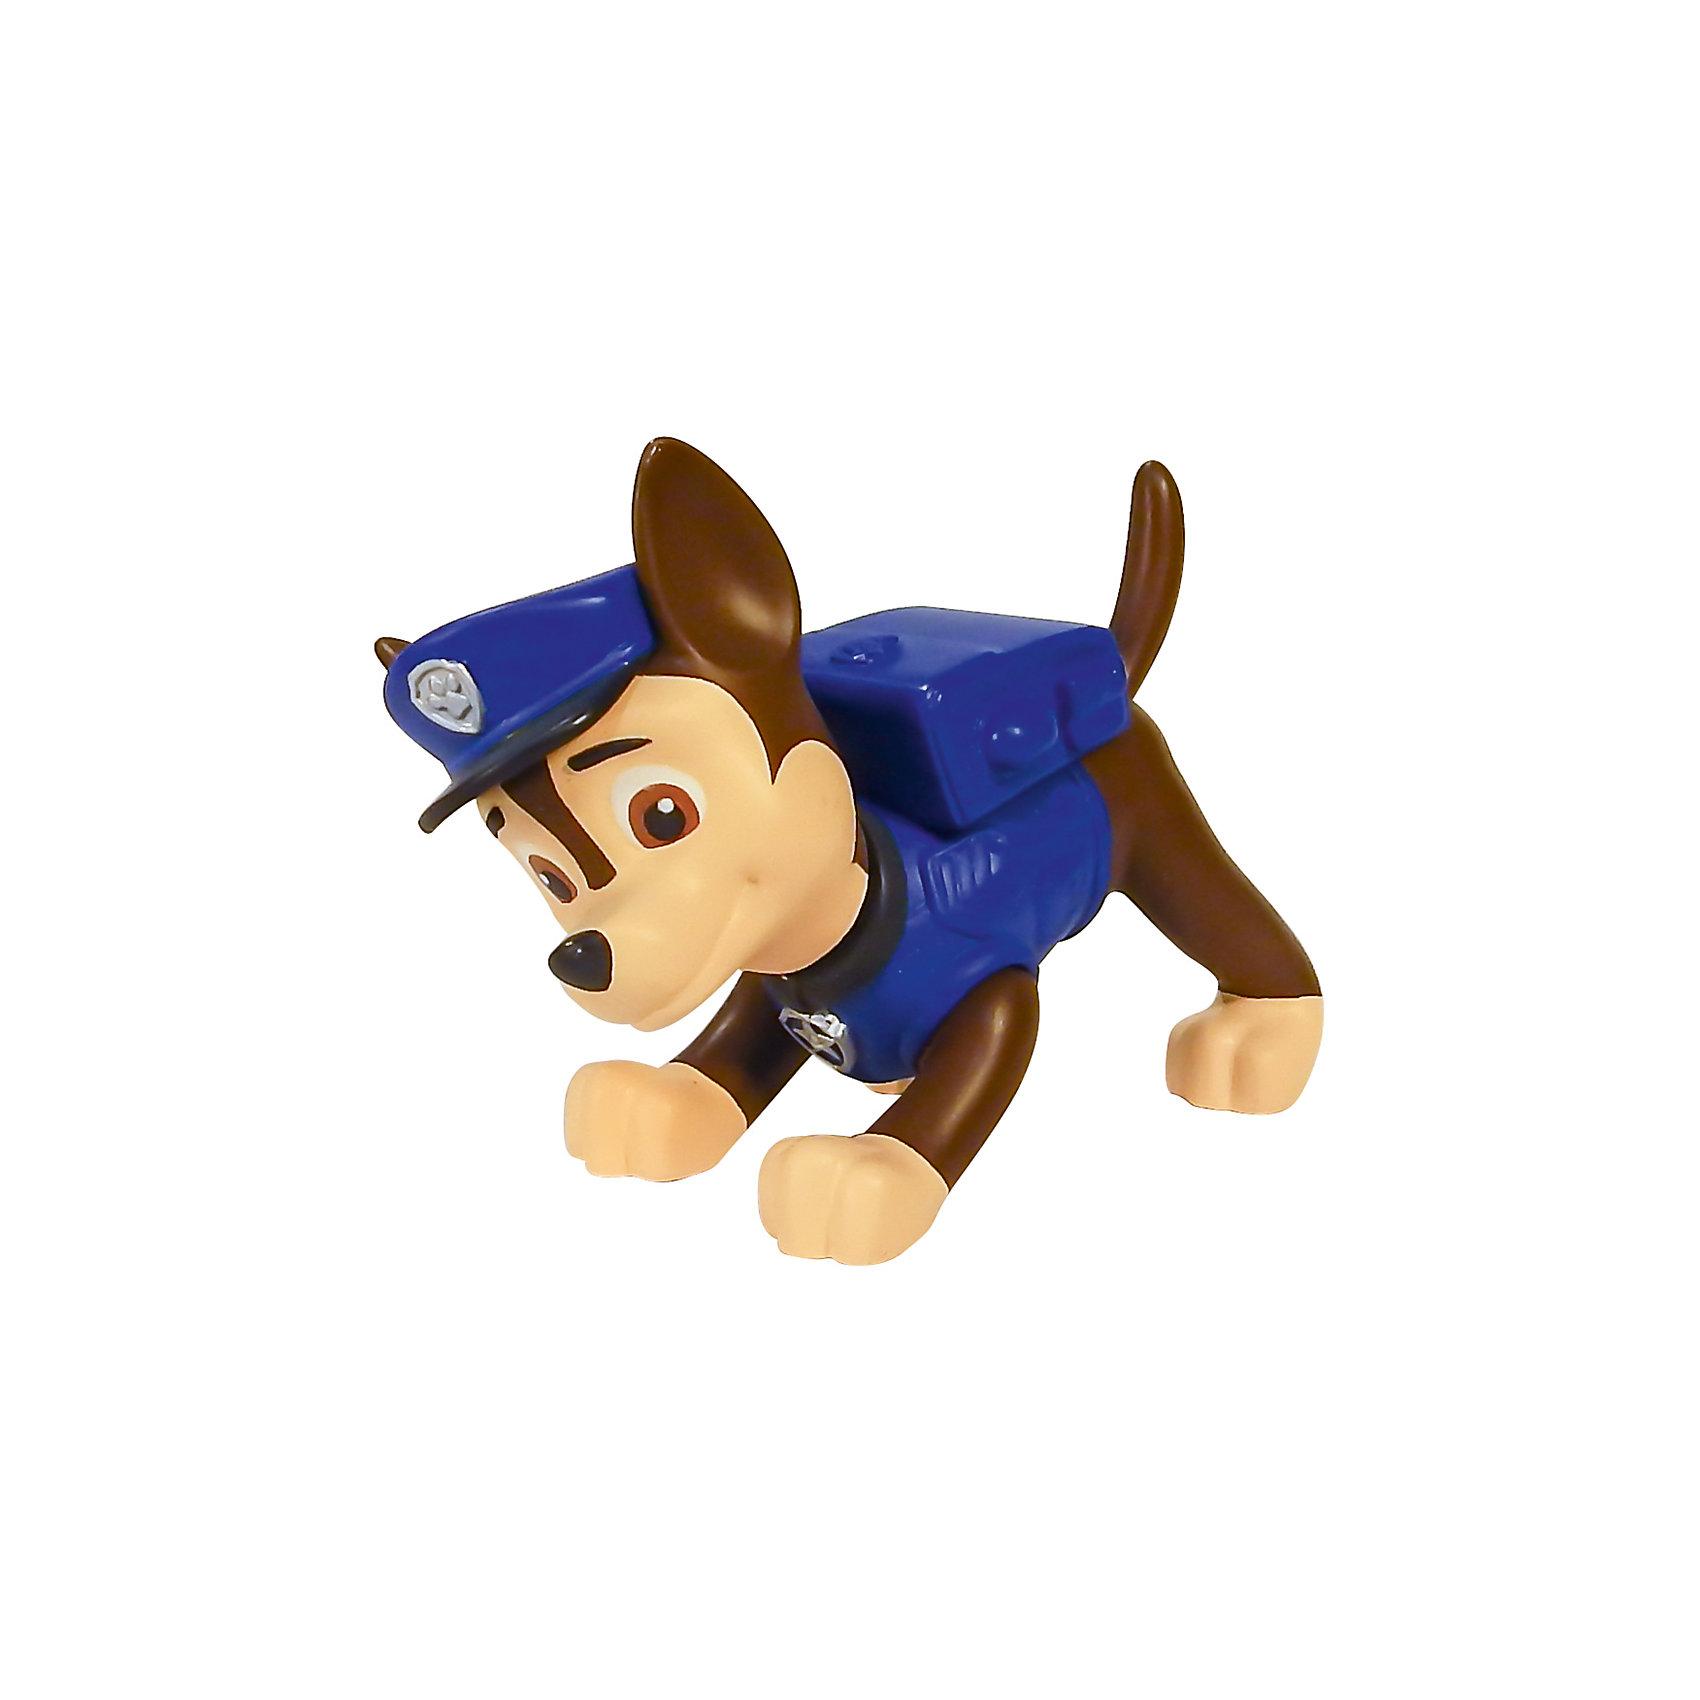 Spin Master Маленькая фигурка щенка Гонщик, Щенячий патруль, Spin Master spin master фигурка спасатель рокки со съемным рюкзаком щенячий патруль